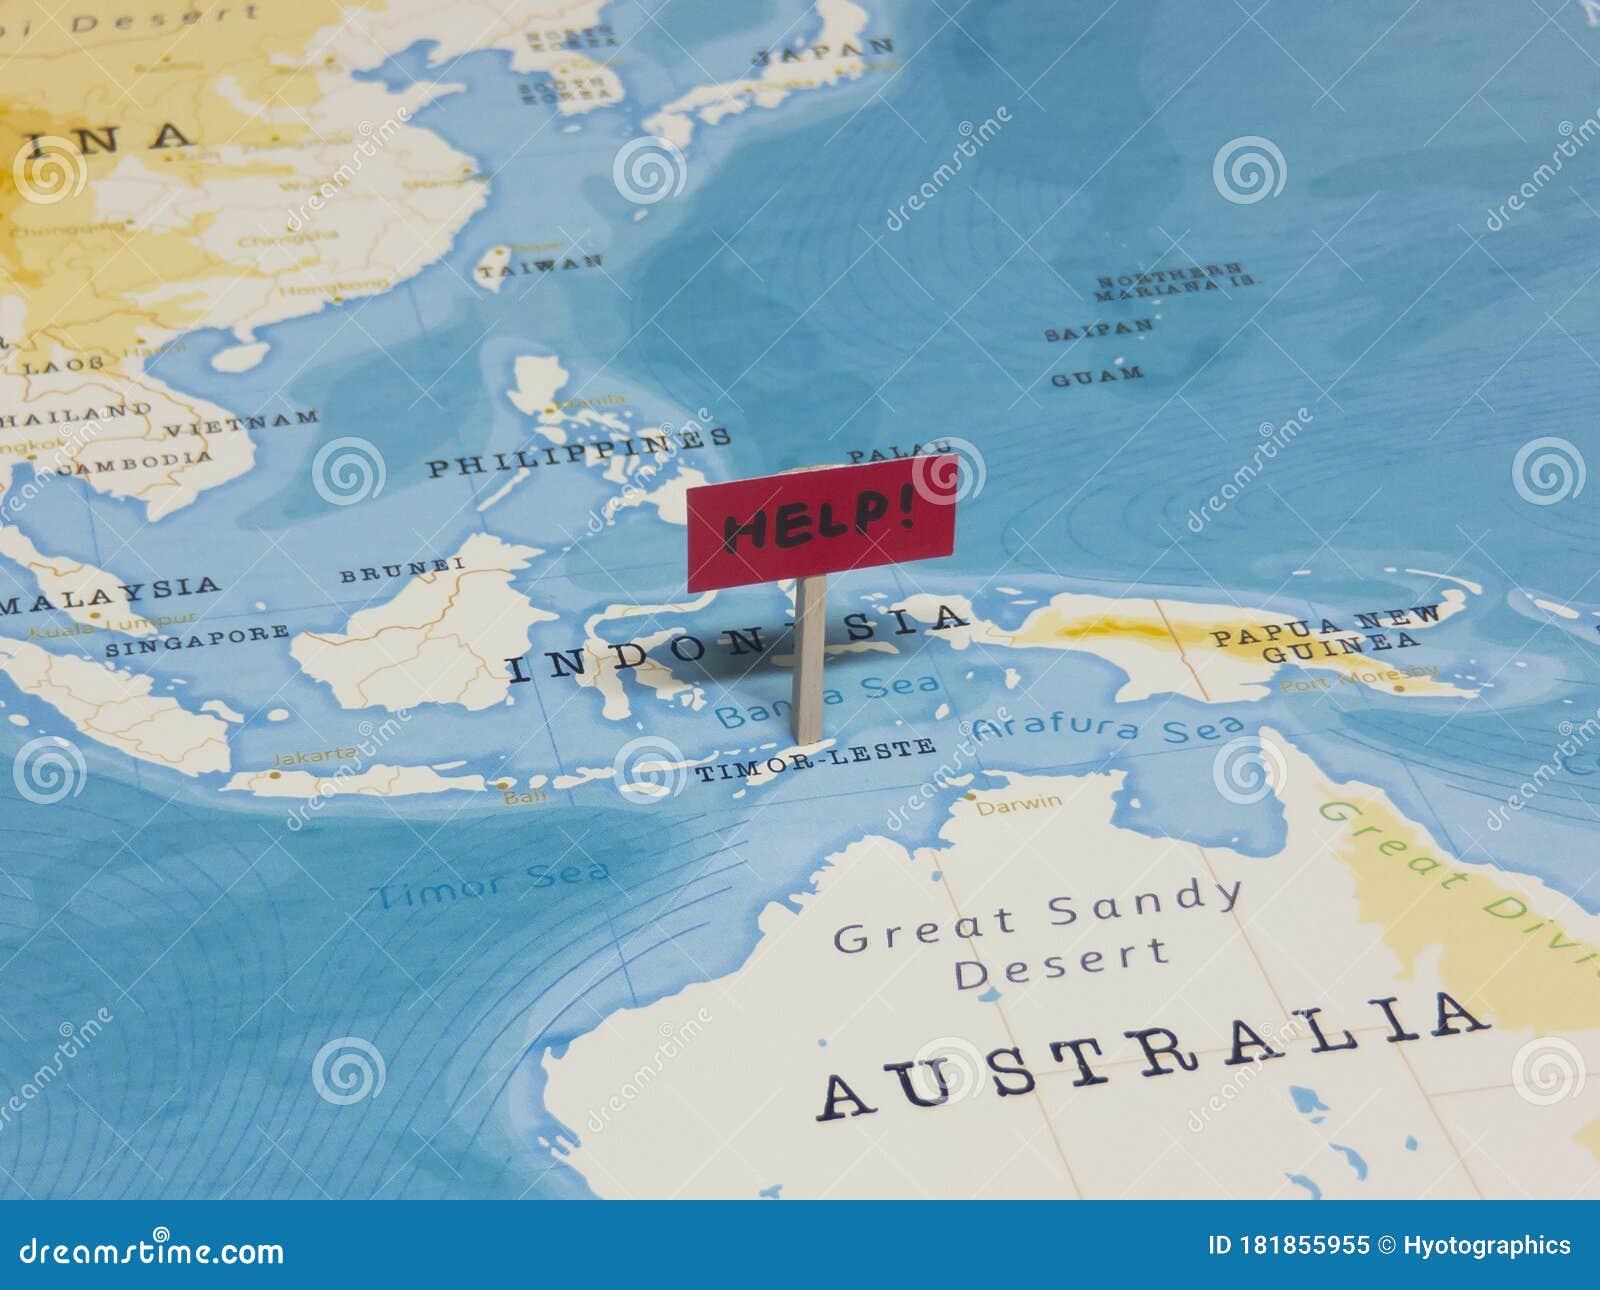 Timor Sea World Map